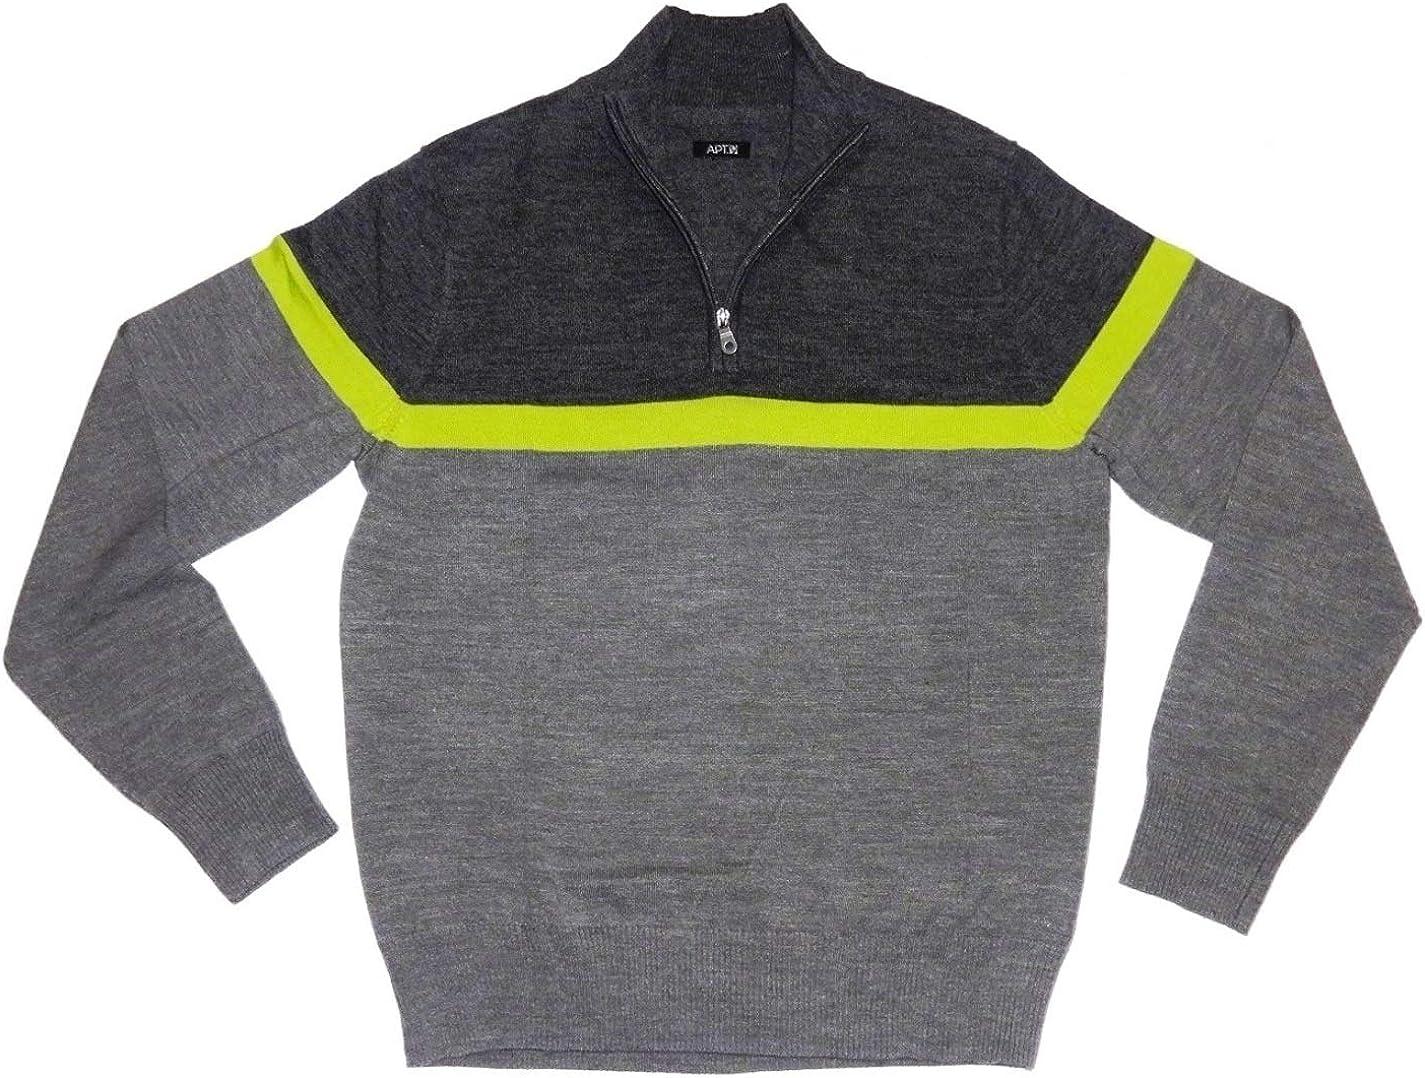 Liz Claiborne's Apt 9 Men's Merino Wool Blend Sweater 1/4-Zip Charcoal Grey Stripe